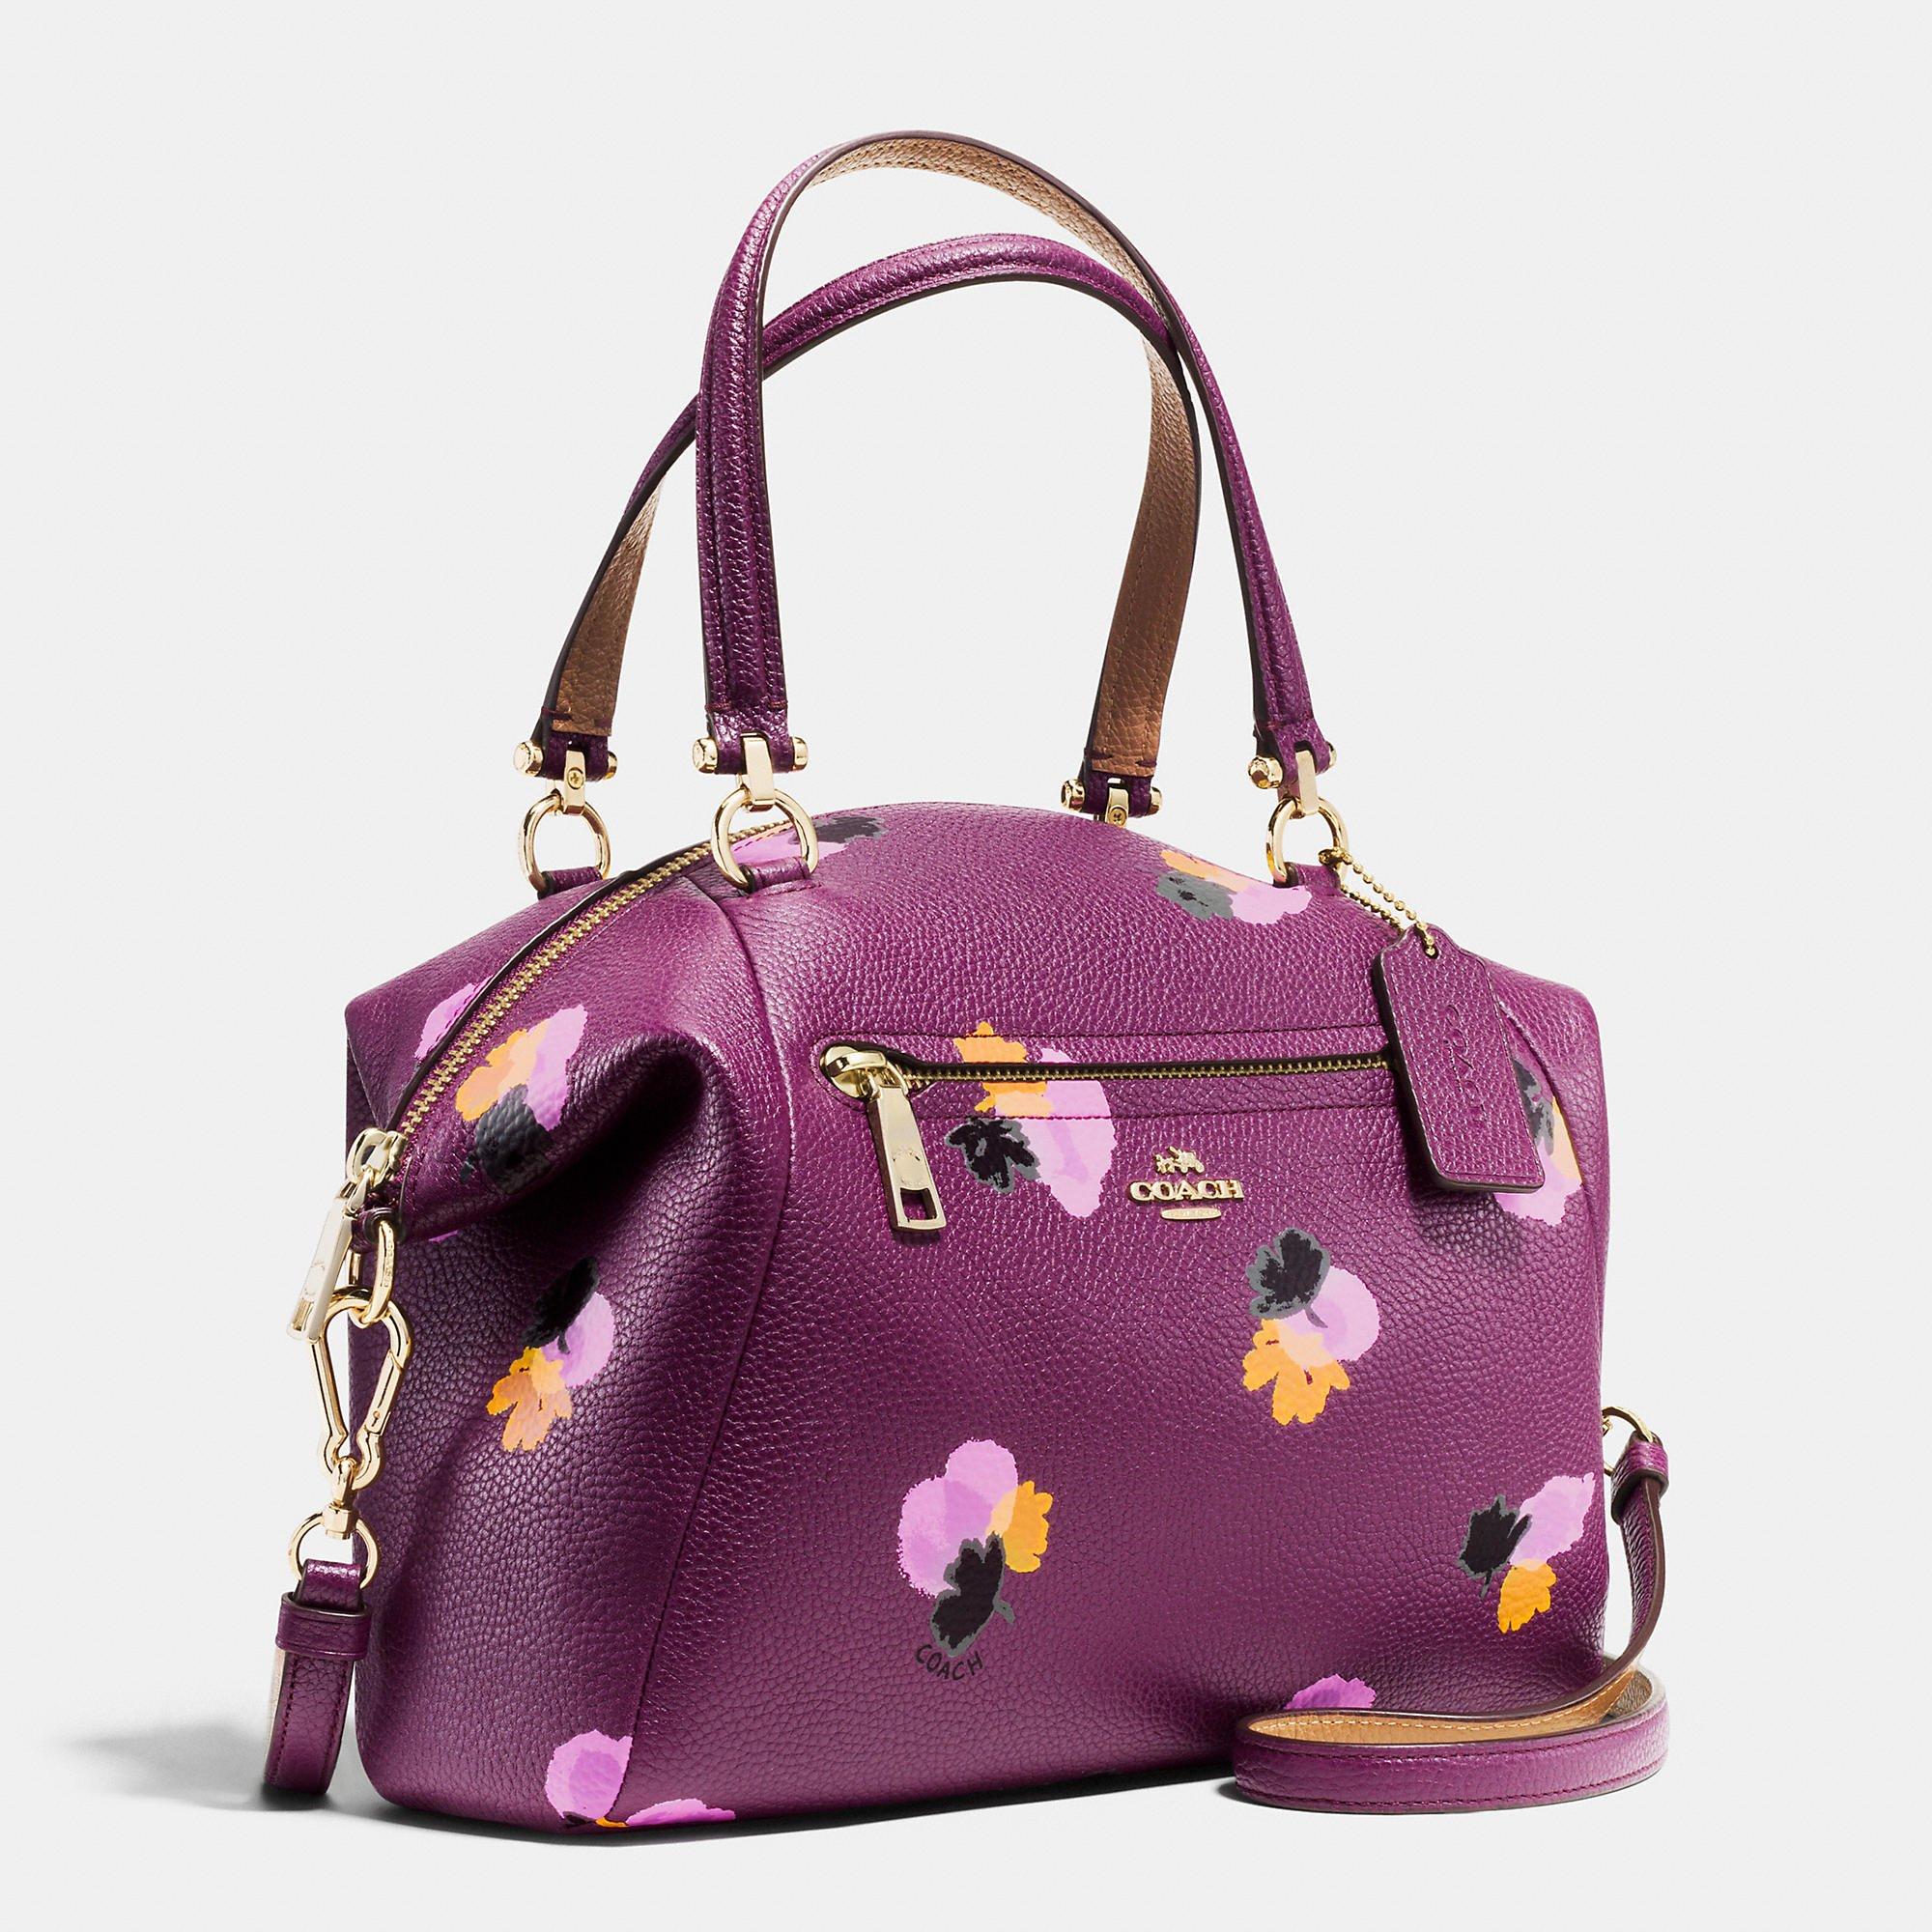 Coach Prairie Satchel In Floral Print Leather In Purple